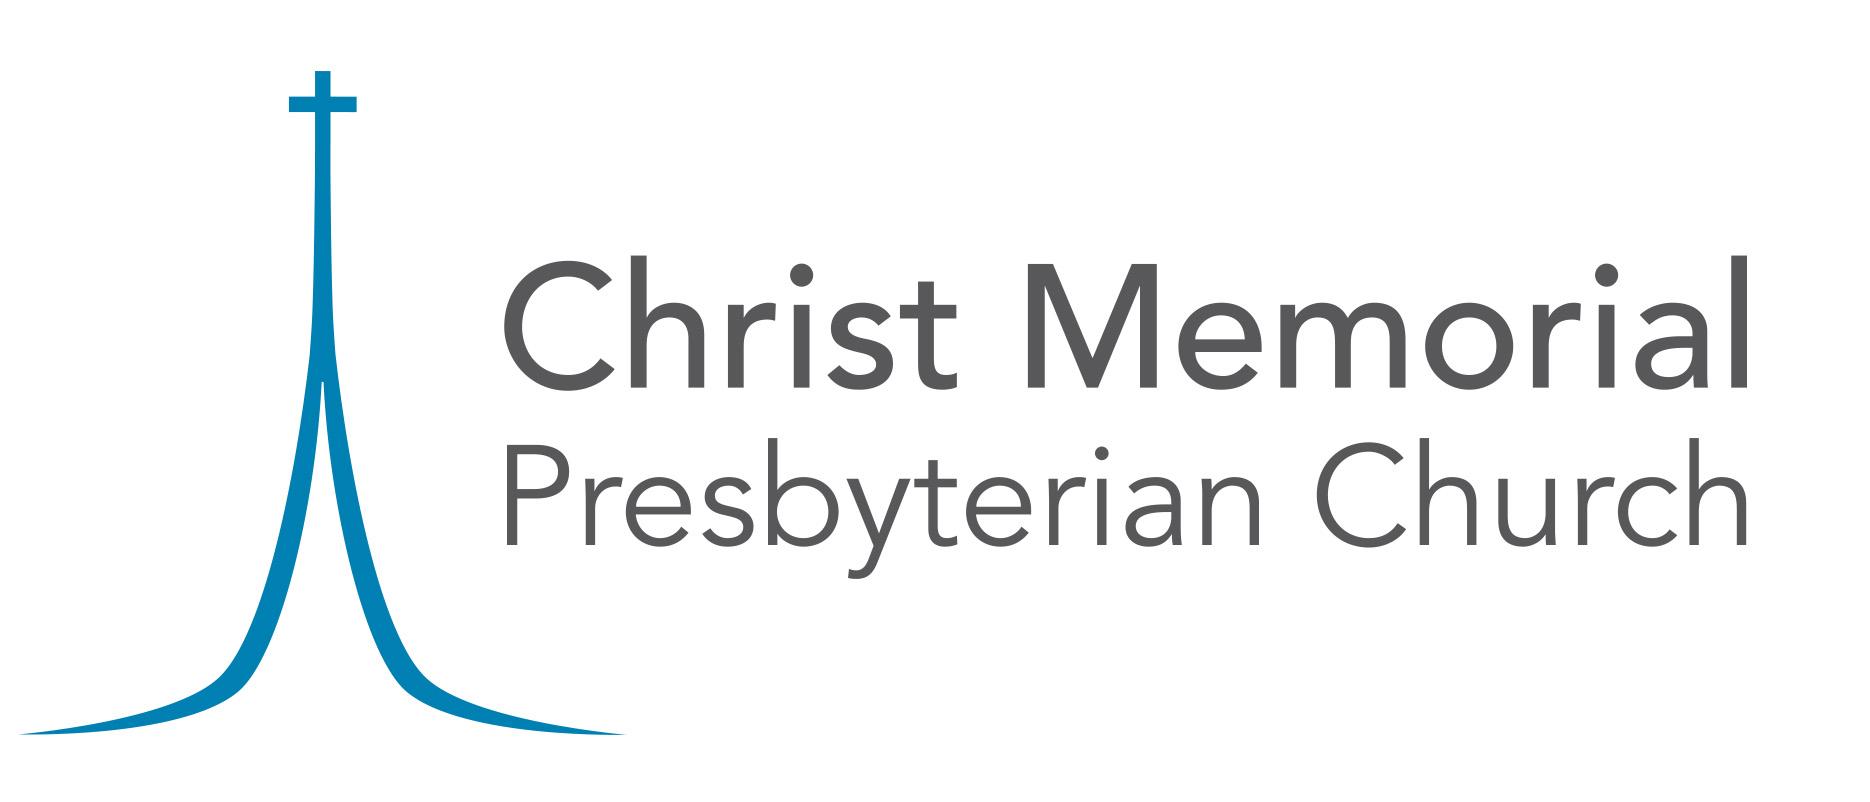 Christ Memorial Presbyterian Church